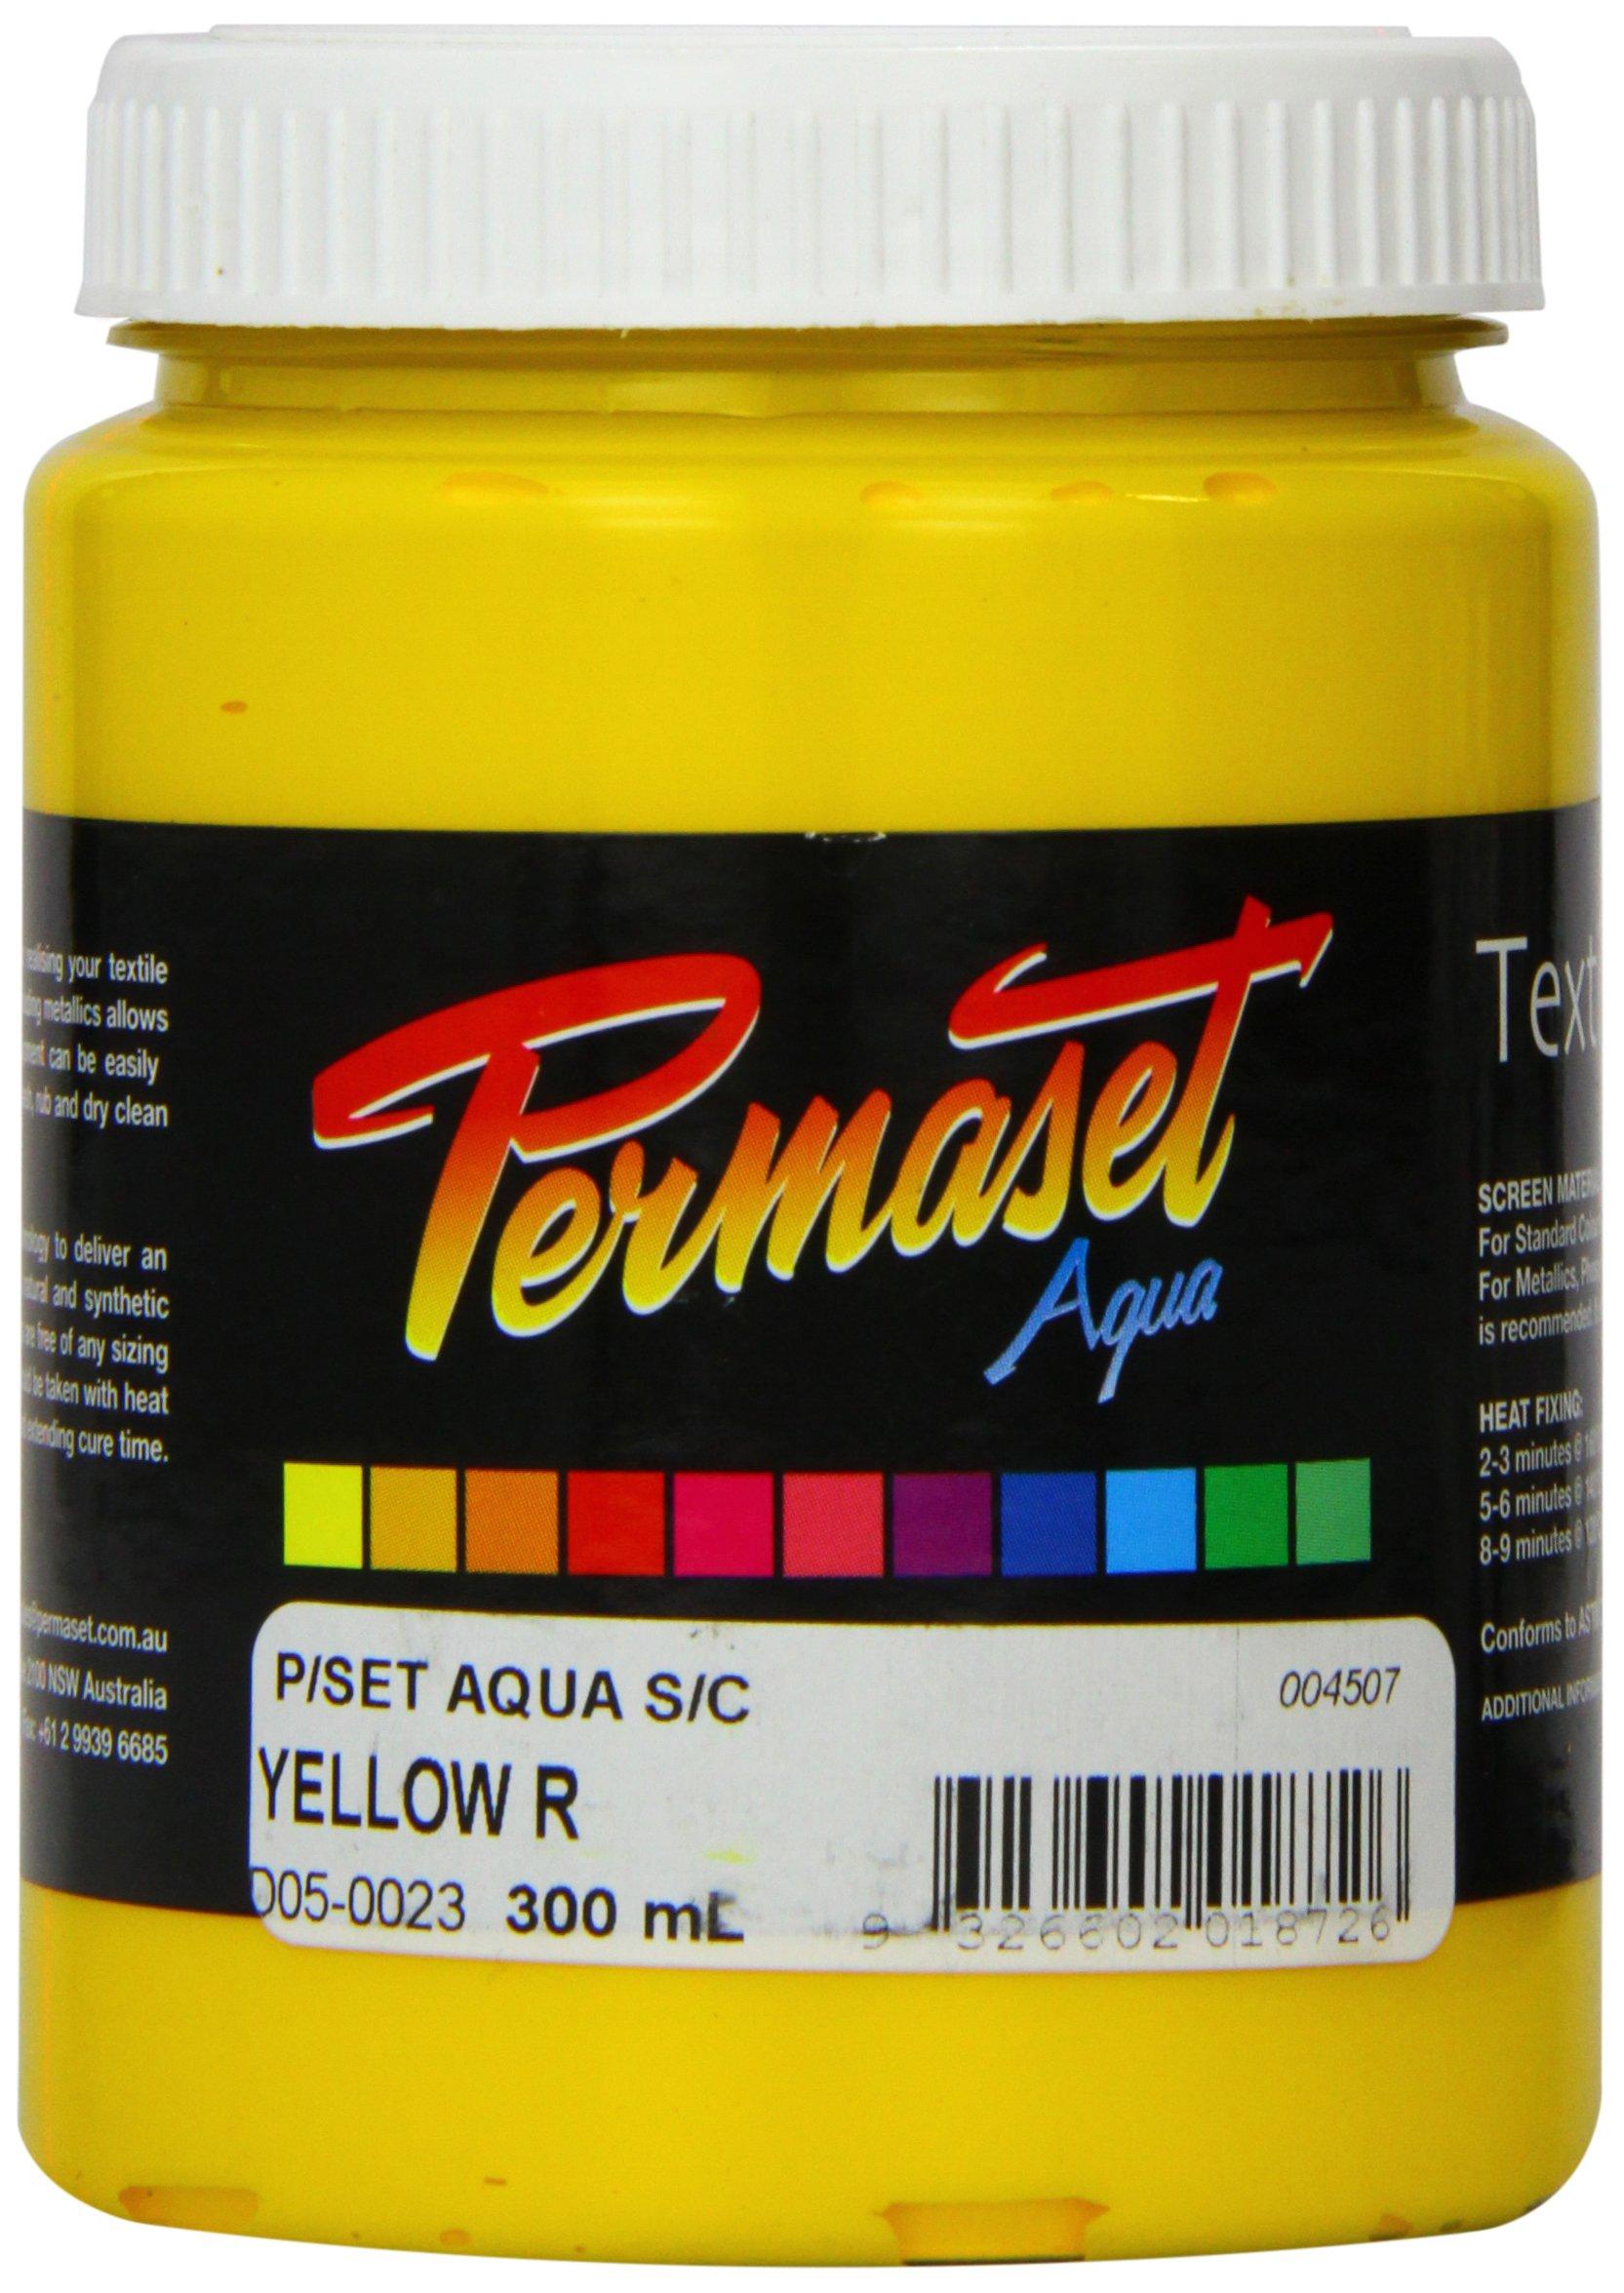 Permaset Aqua Supercover 300ml Fabric Printing Ink - Yellow by Permaset